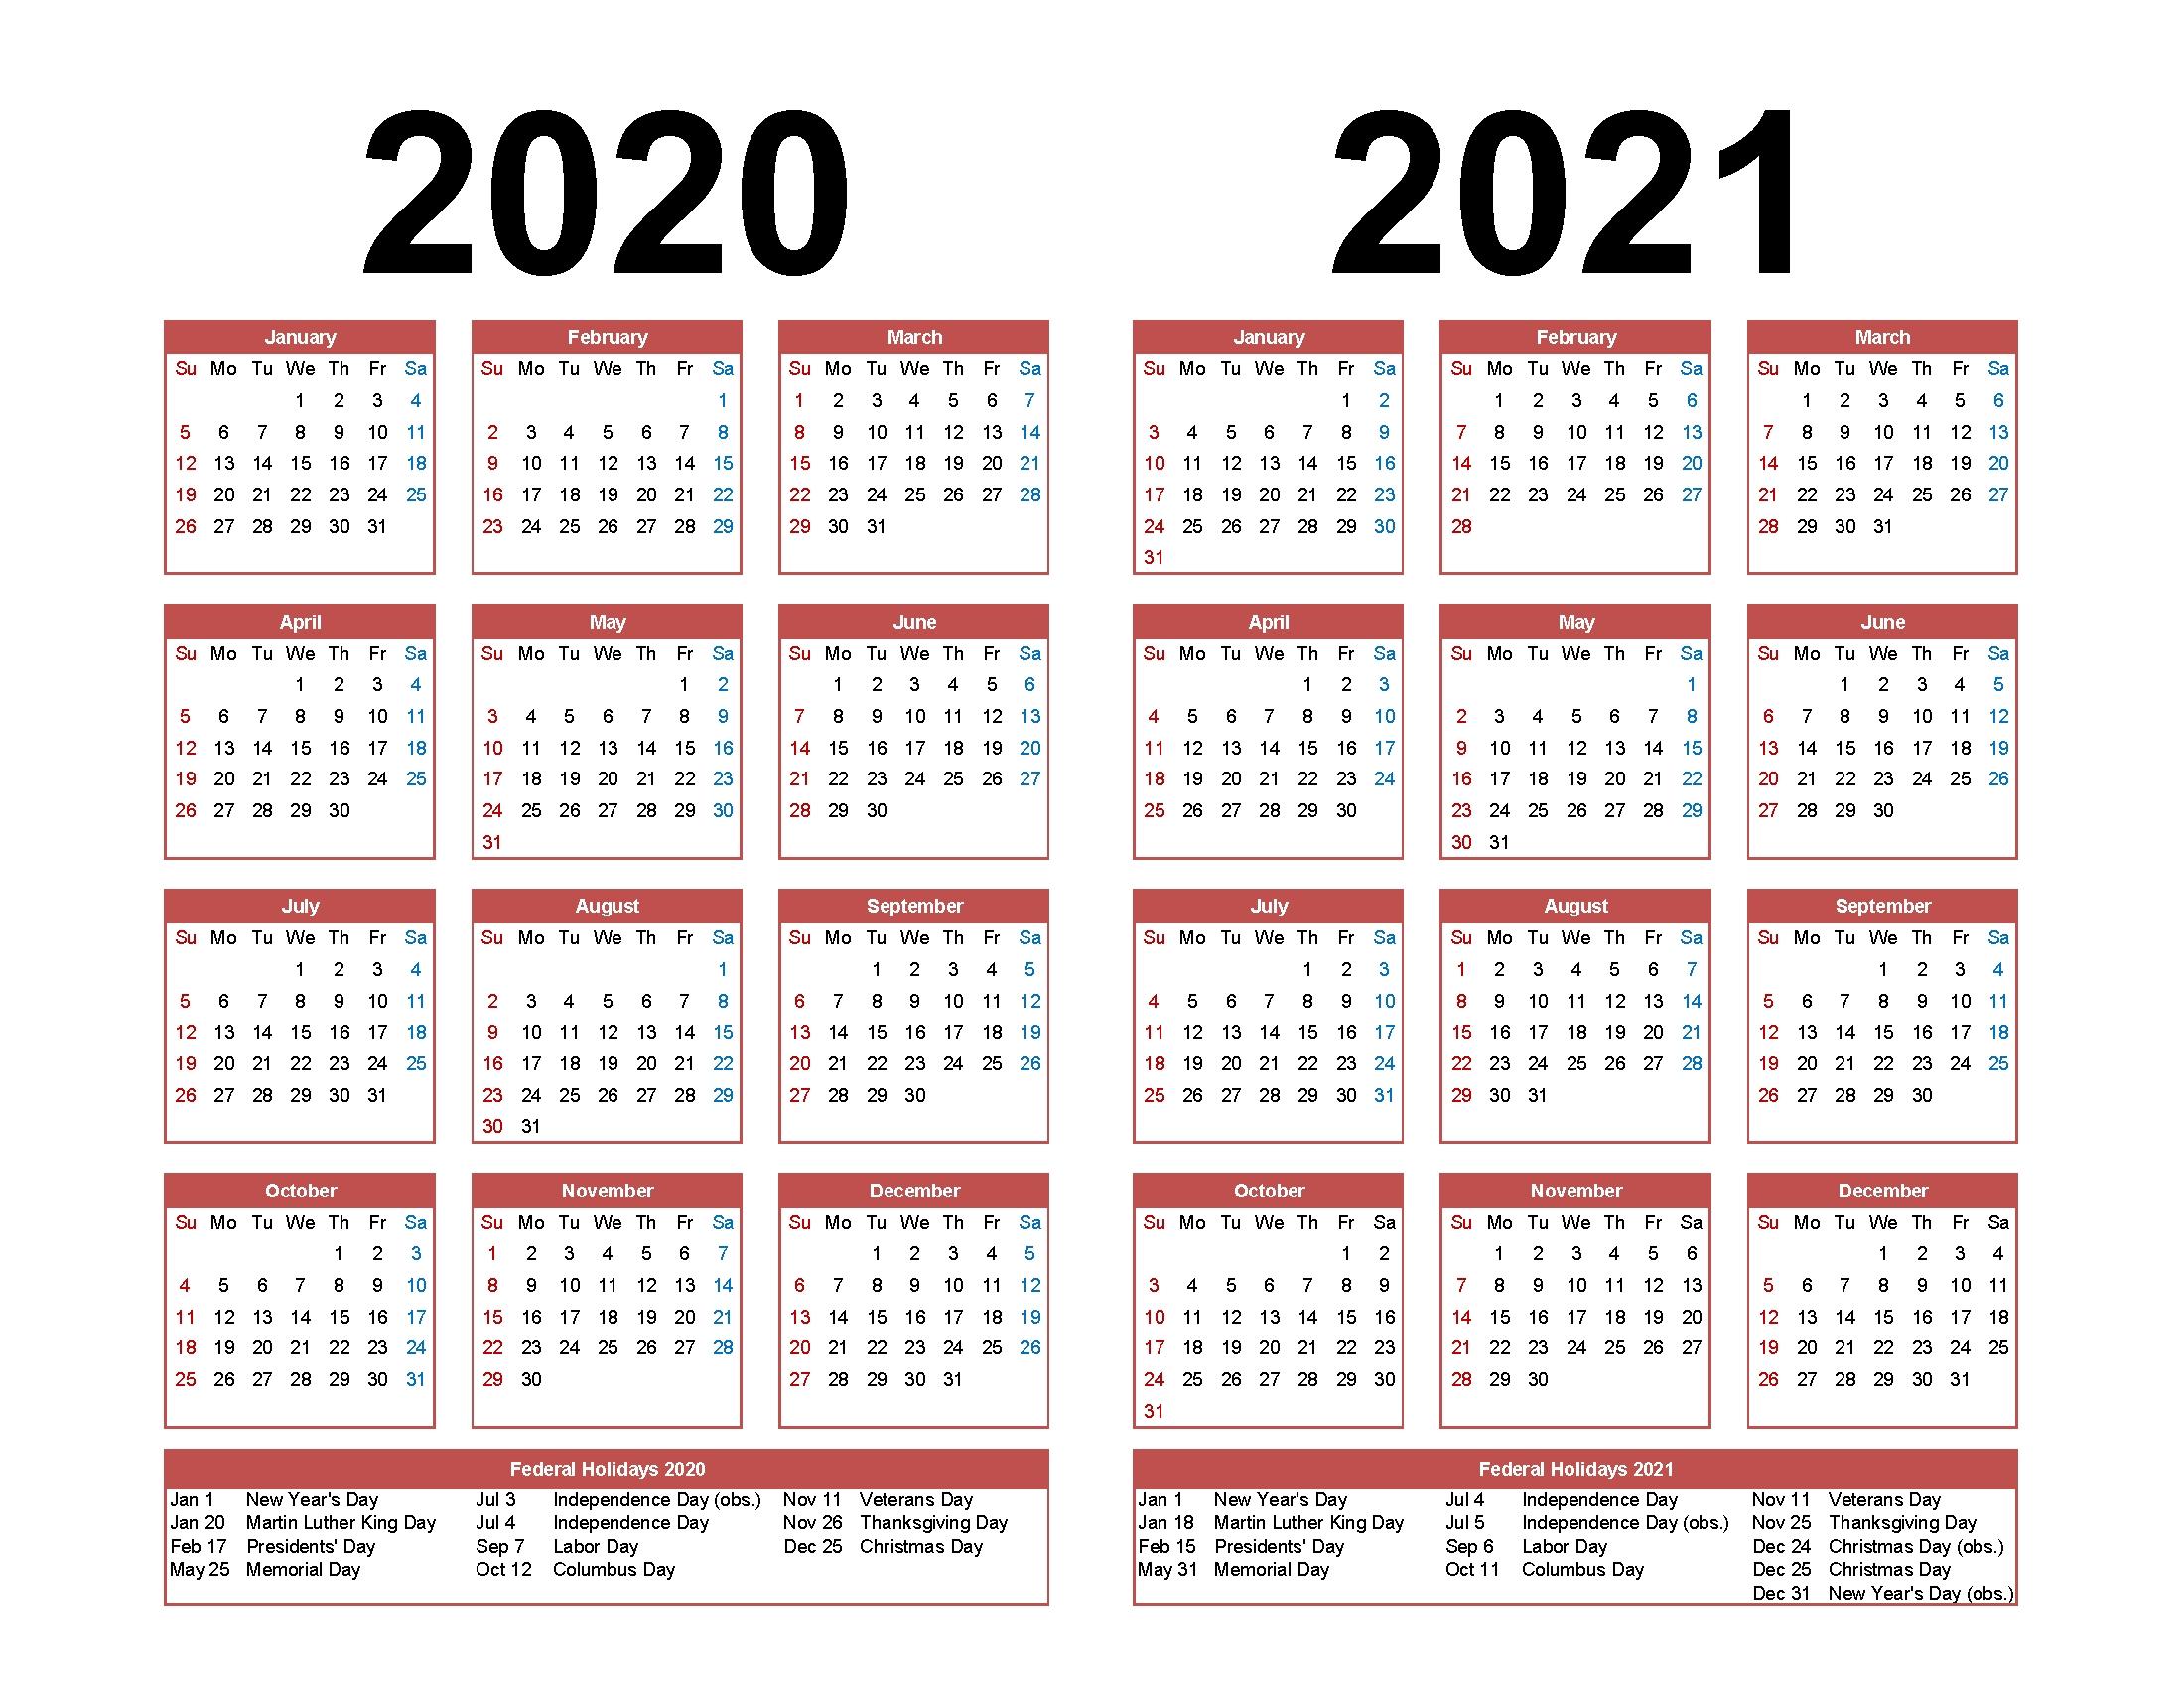 Printable Calendar 2020 2021 Two Year Per Page Free Pdf Free Printable 2 Page Calendar 2020